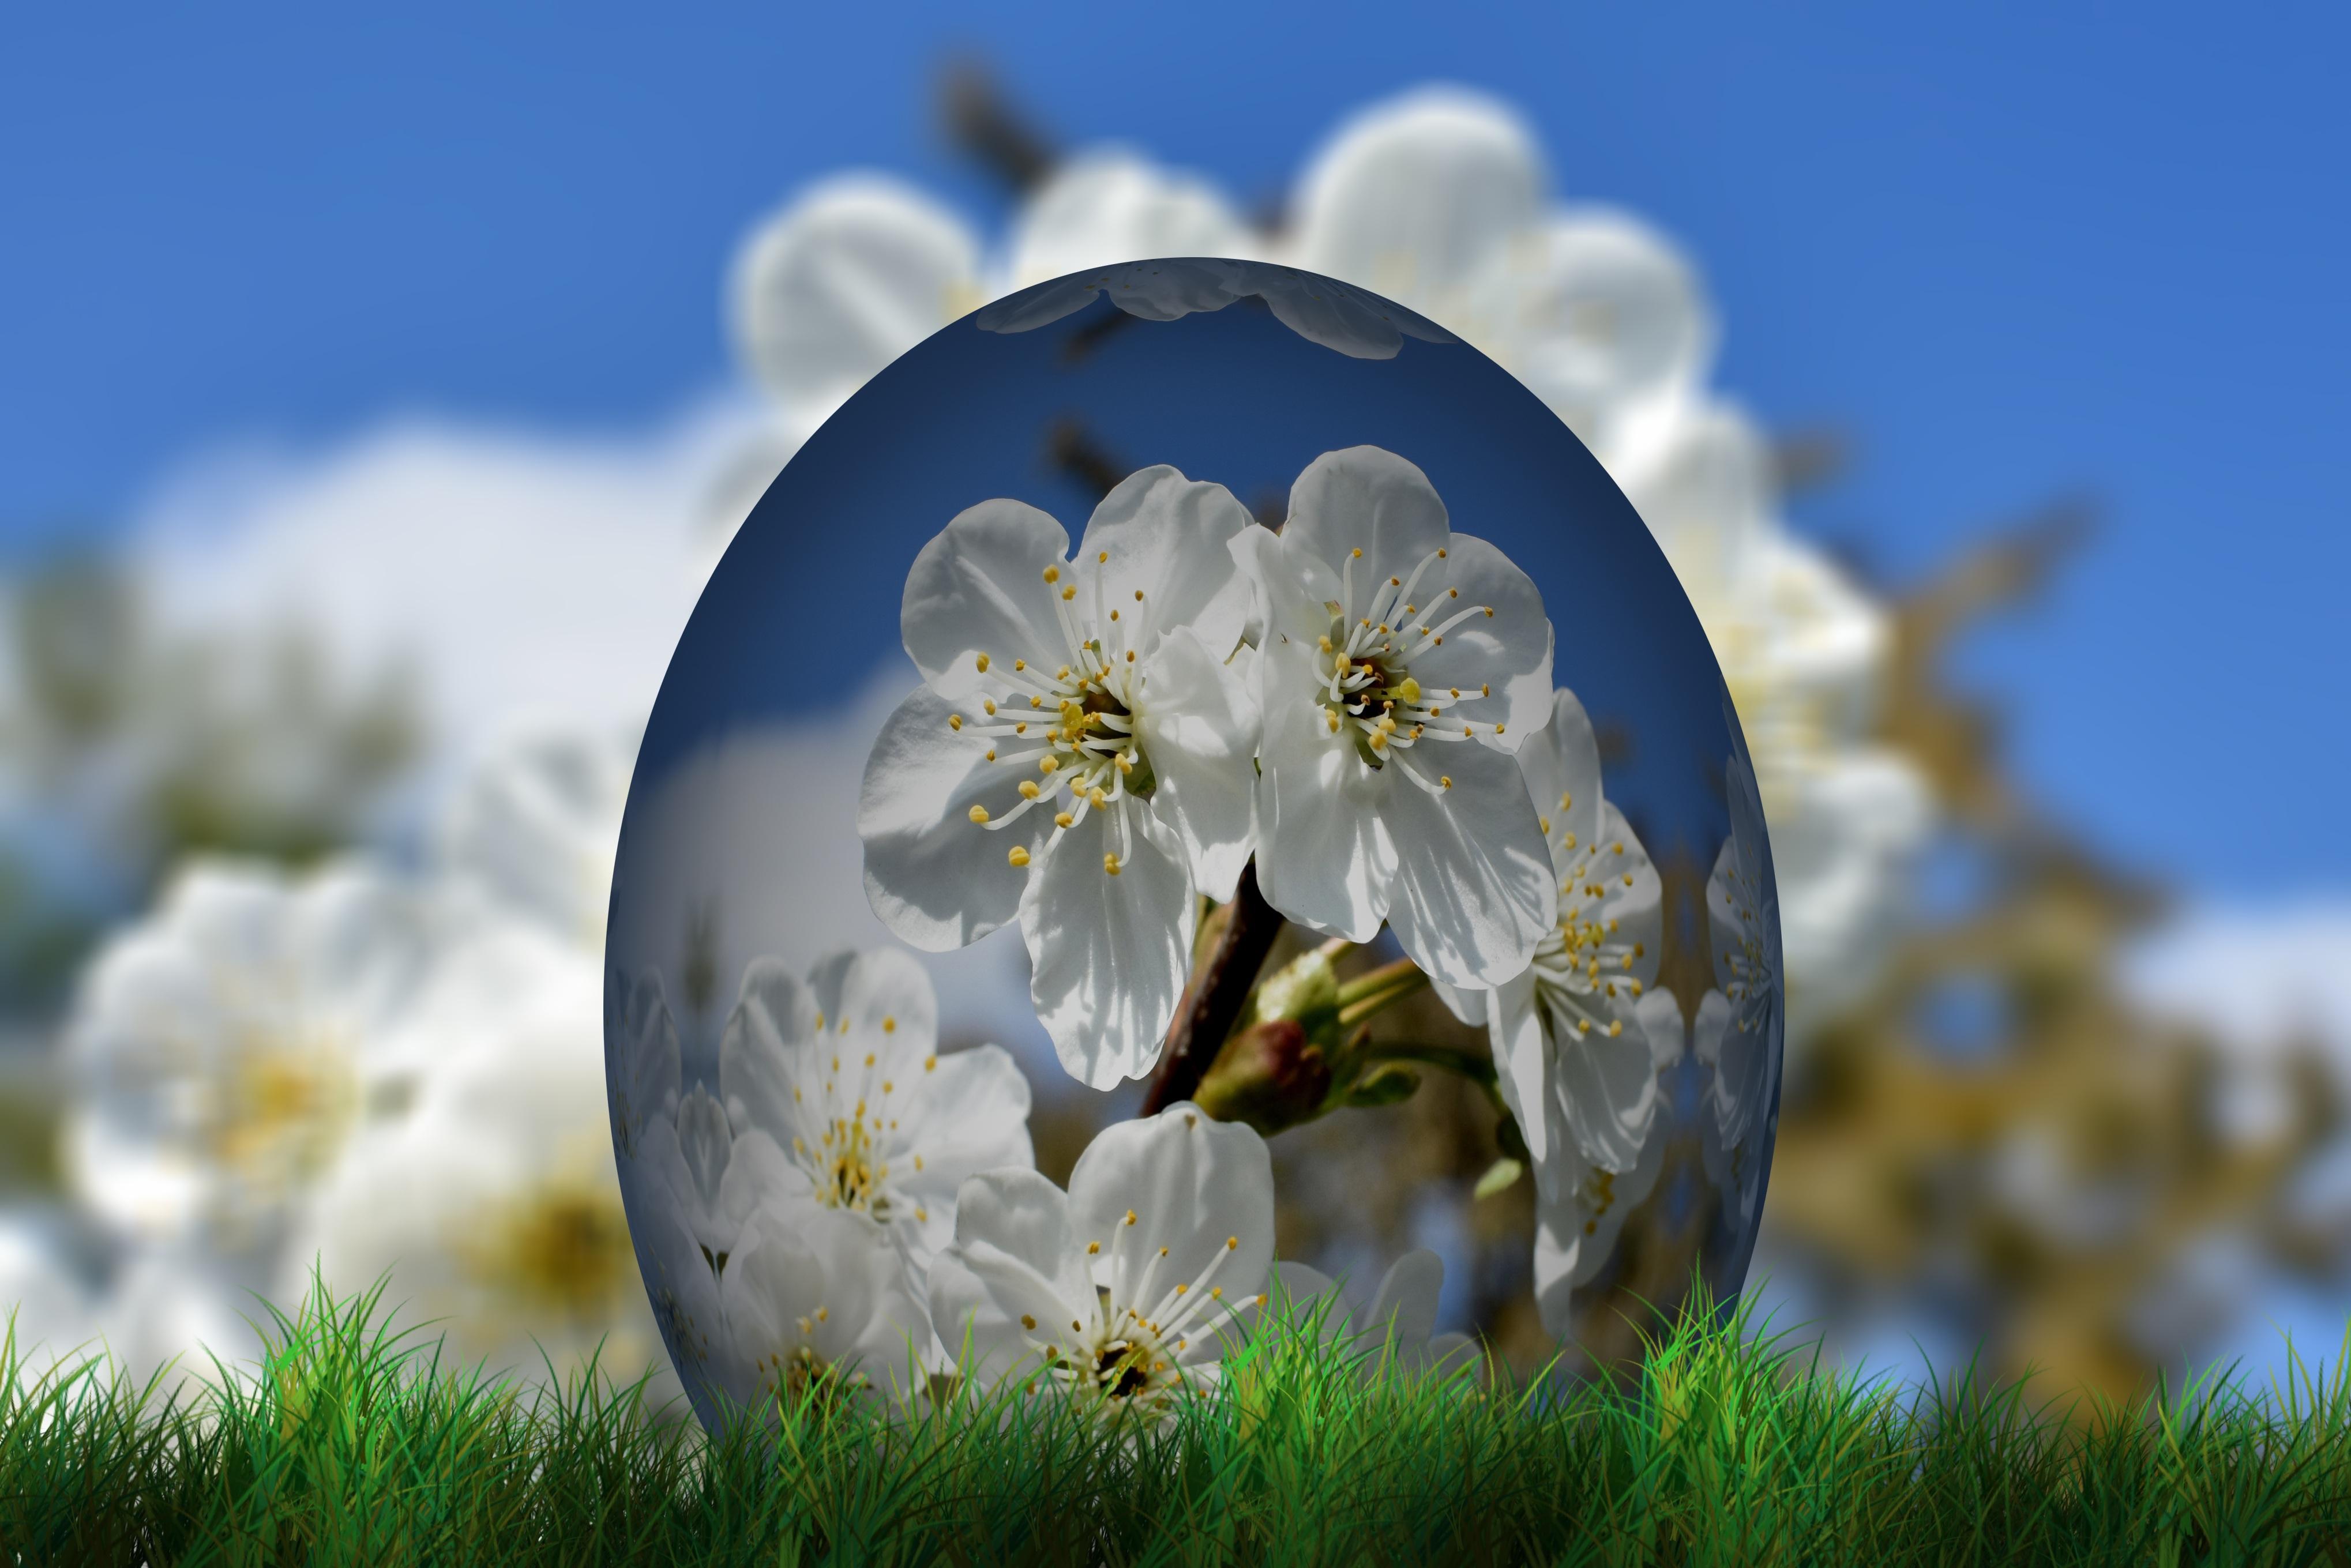 Hd Background Com: Gambar Wallpaper Bunga Sakura